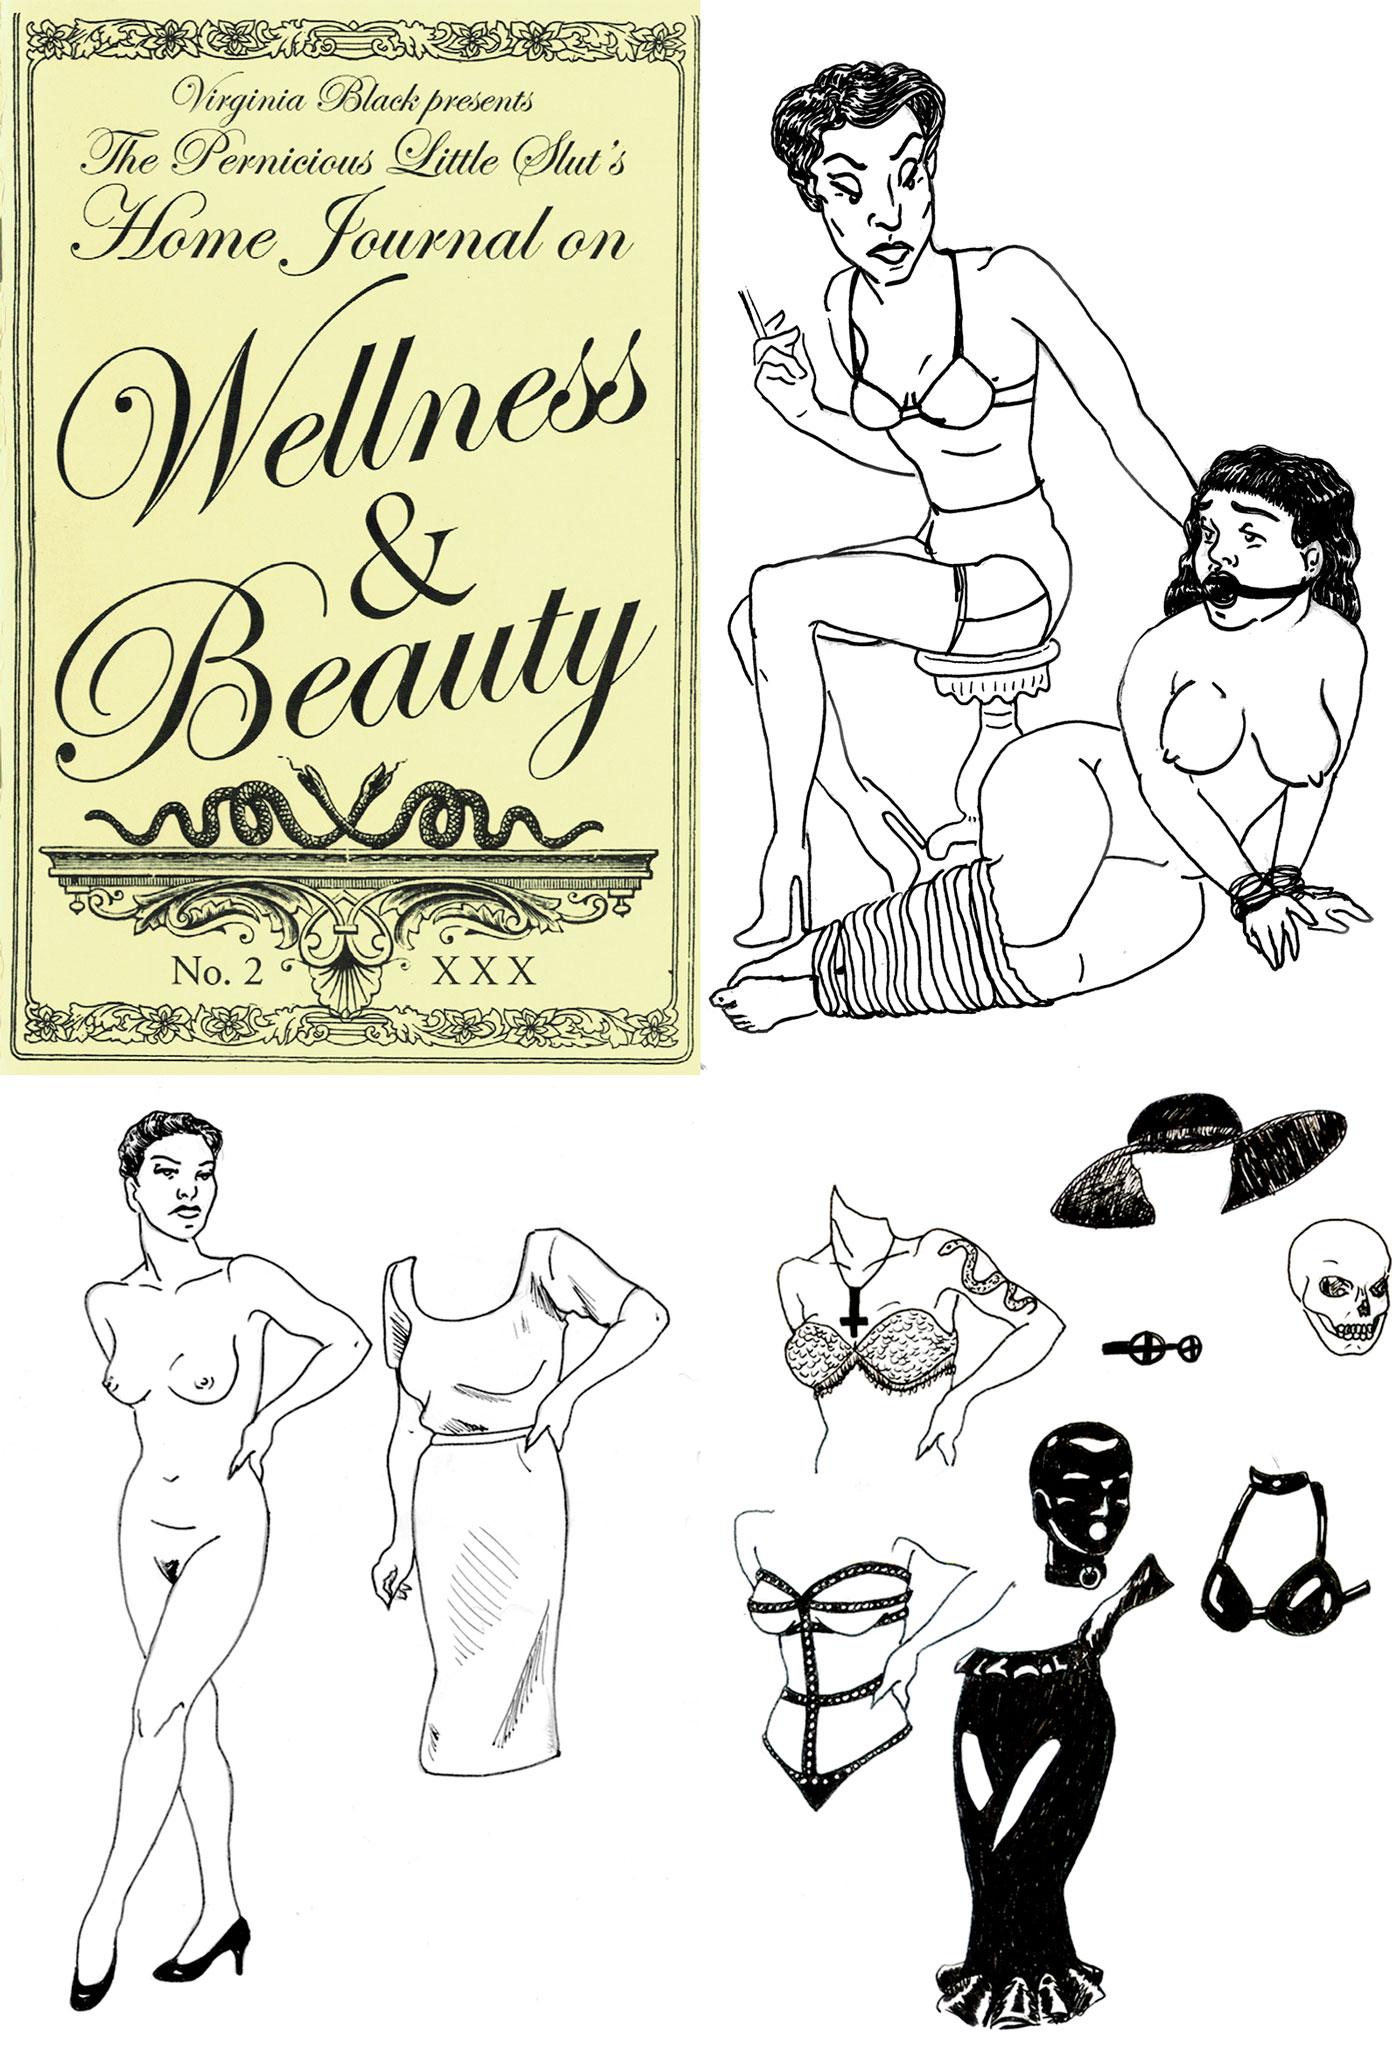 Wellness & Beauty vol. 2